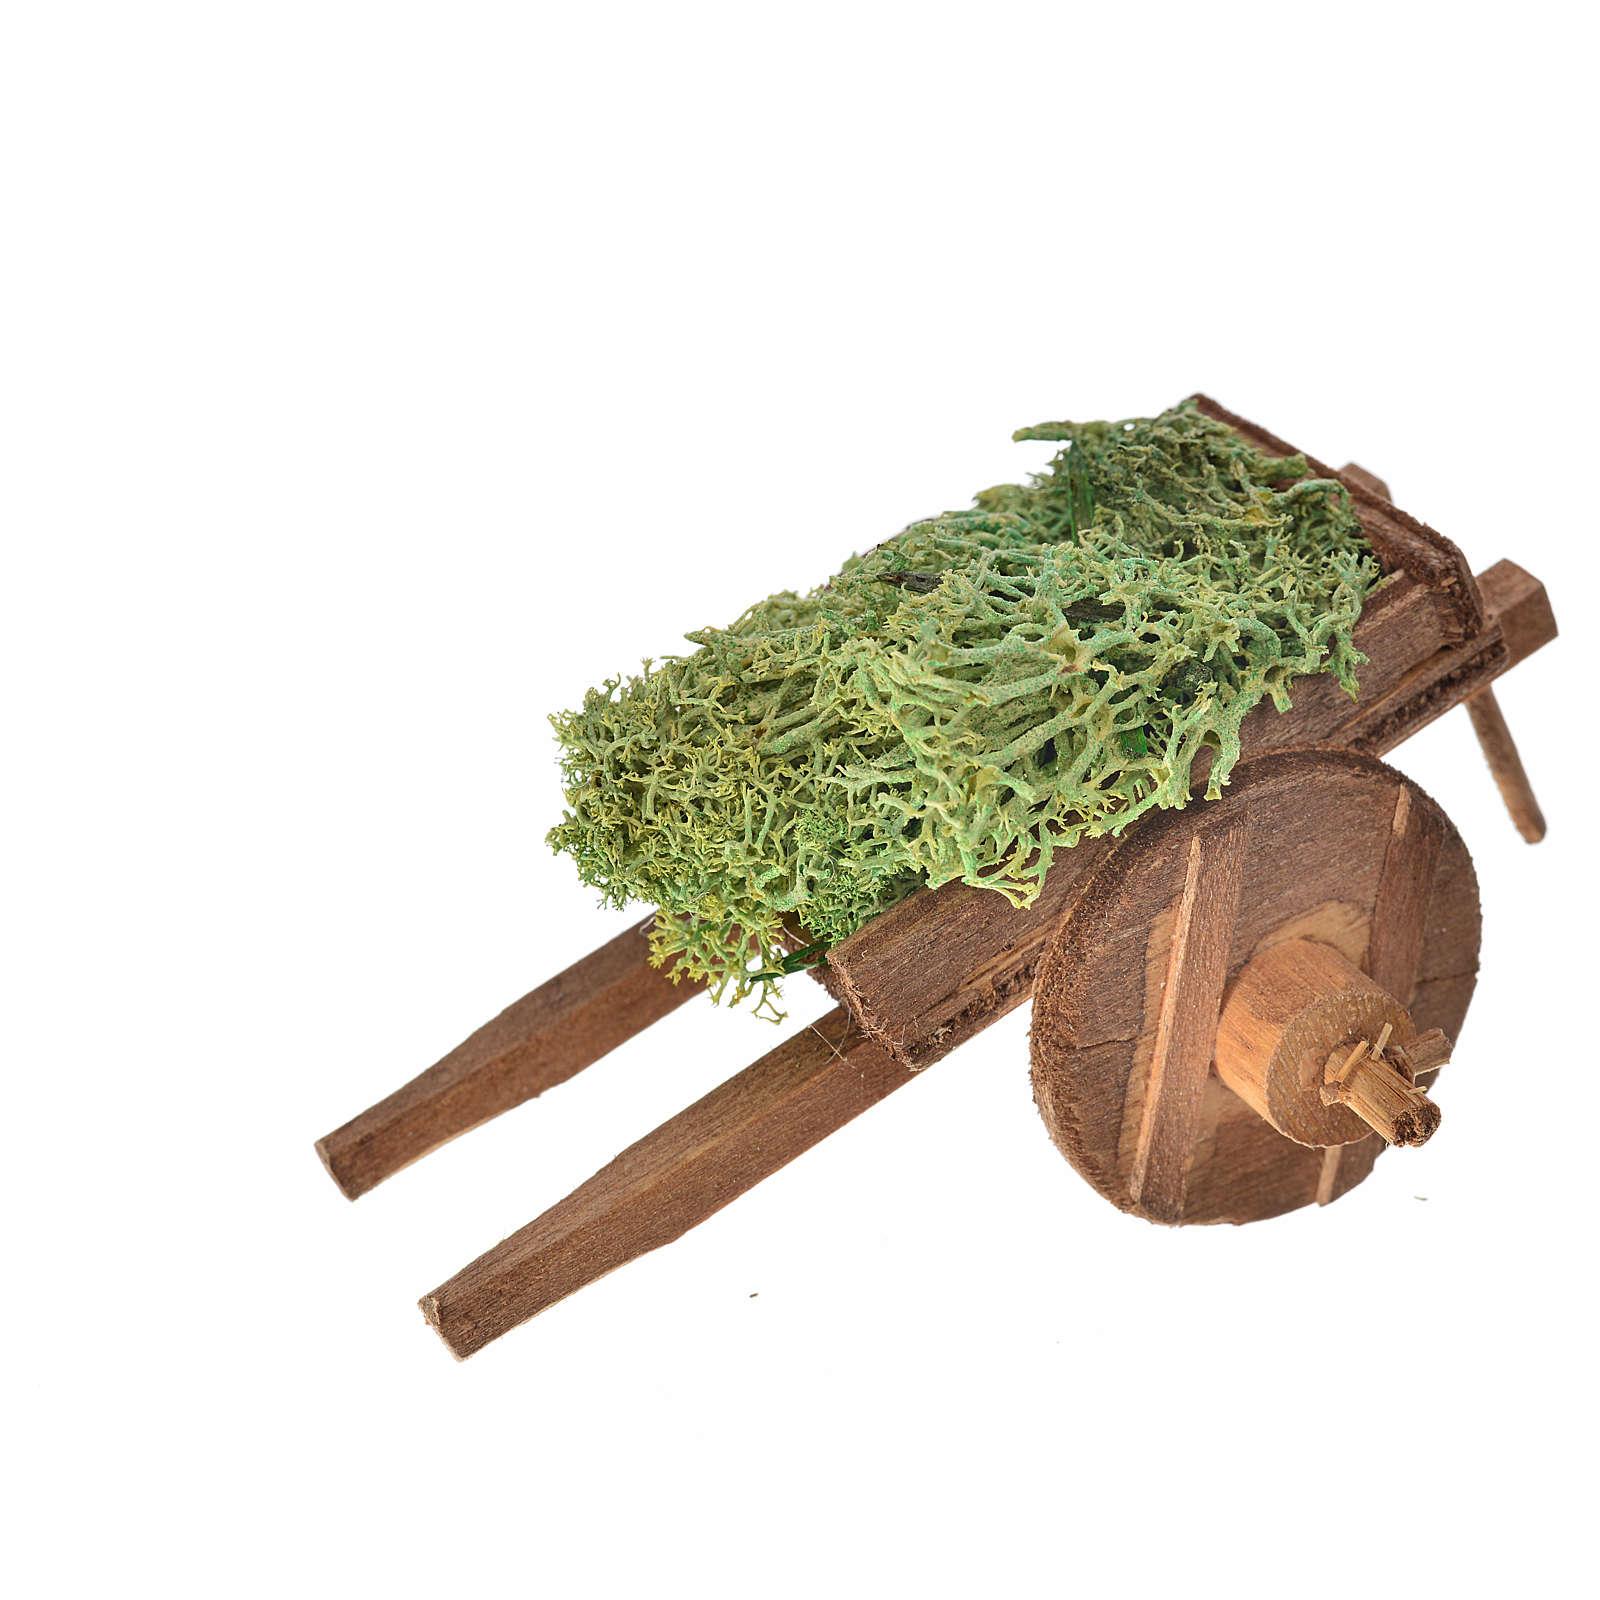 Carro napoletano lichene 5,5x7,5x5,5 cm 4